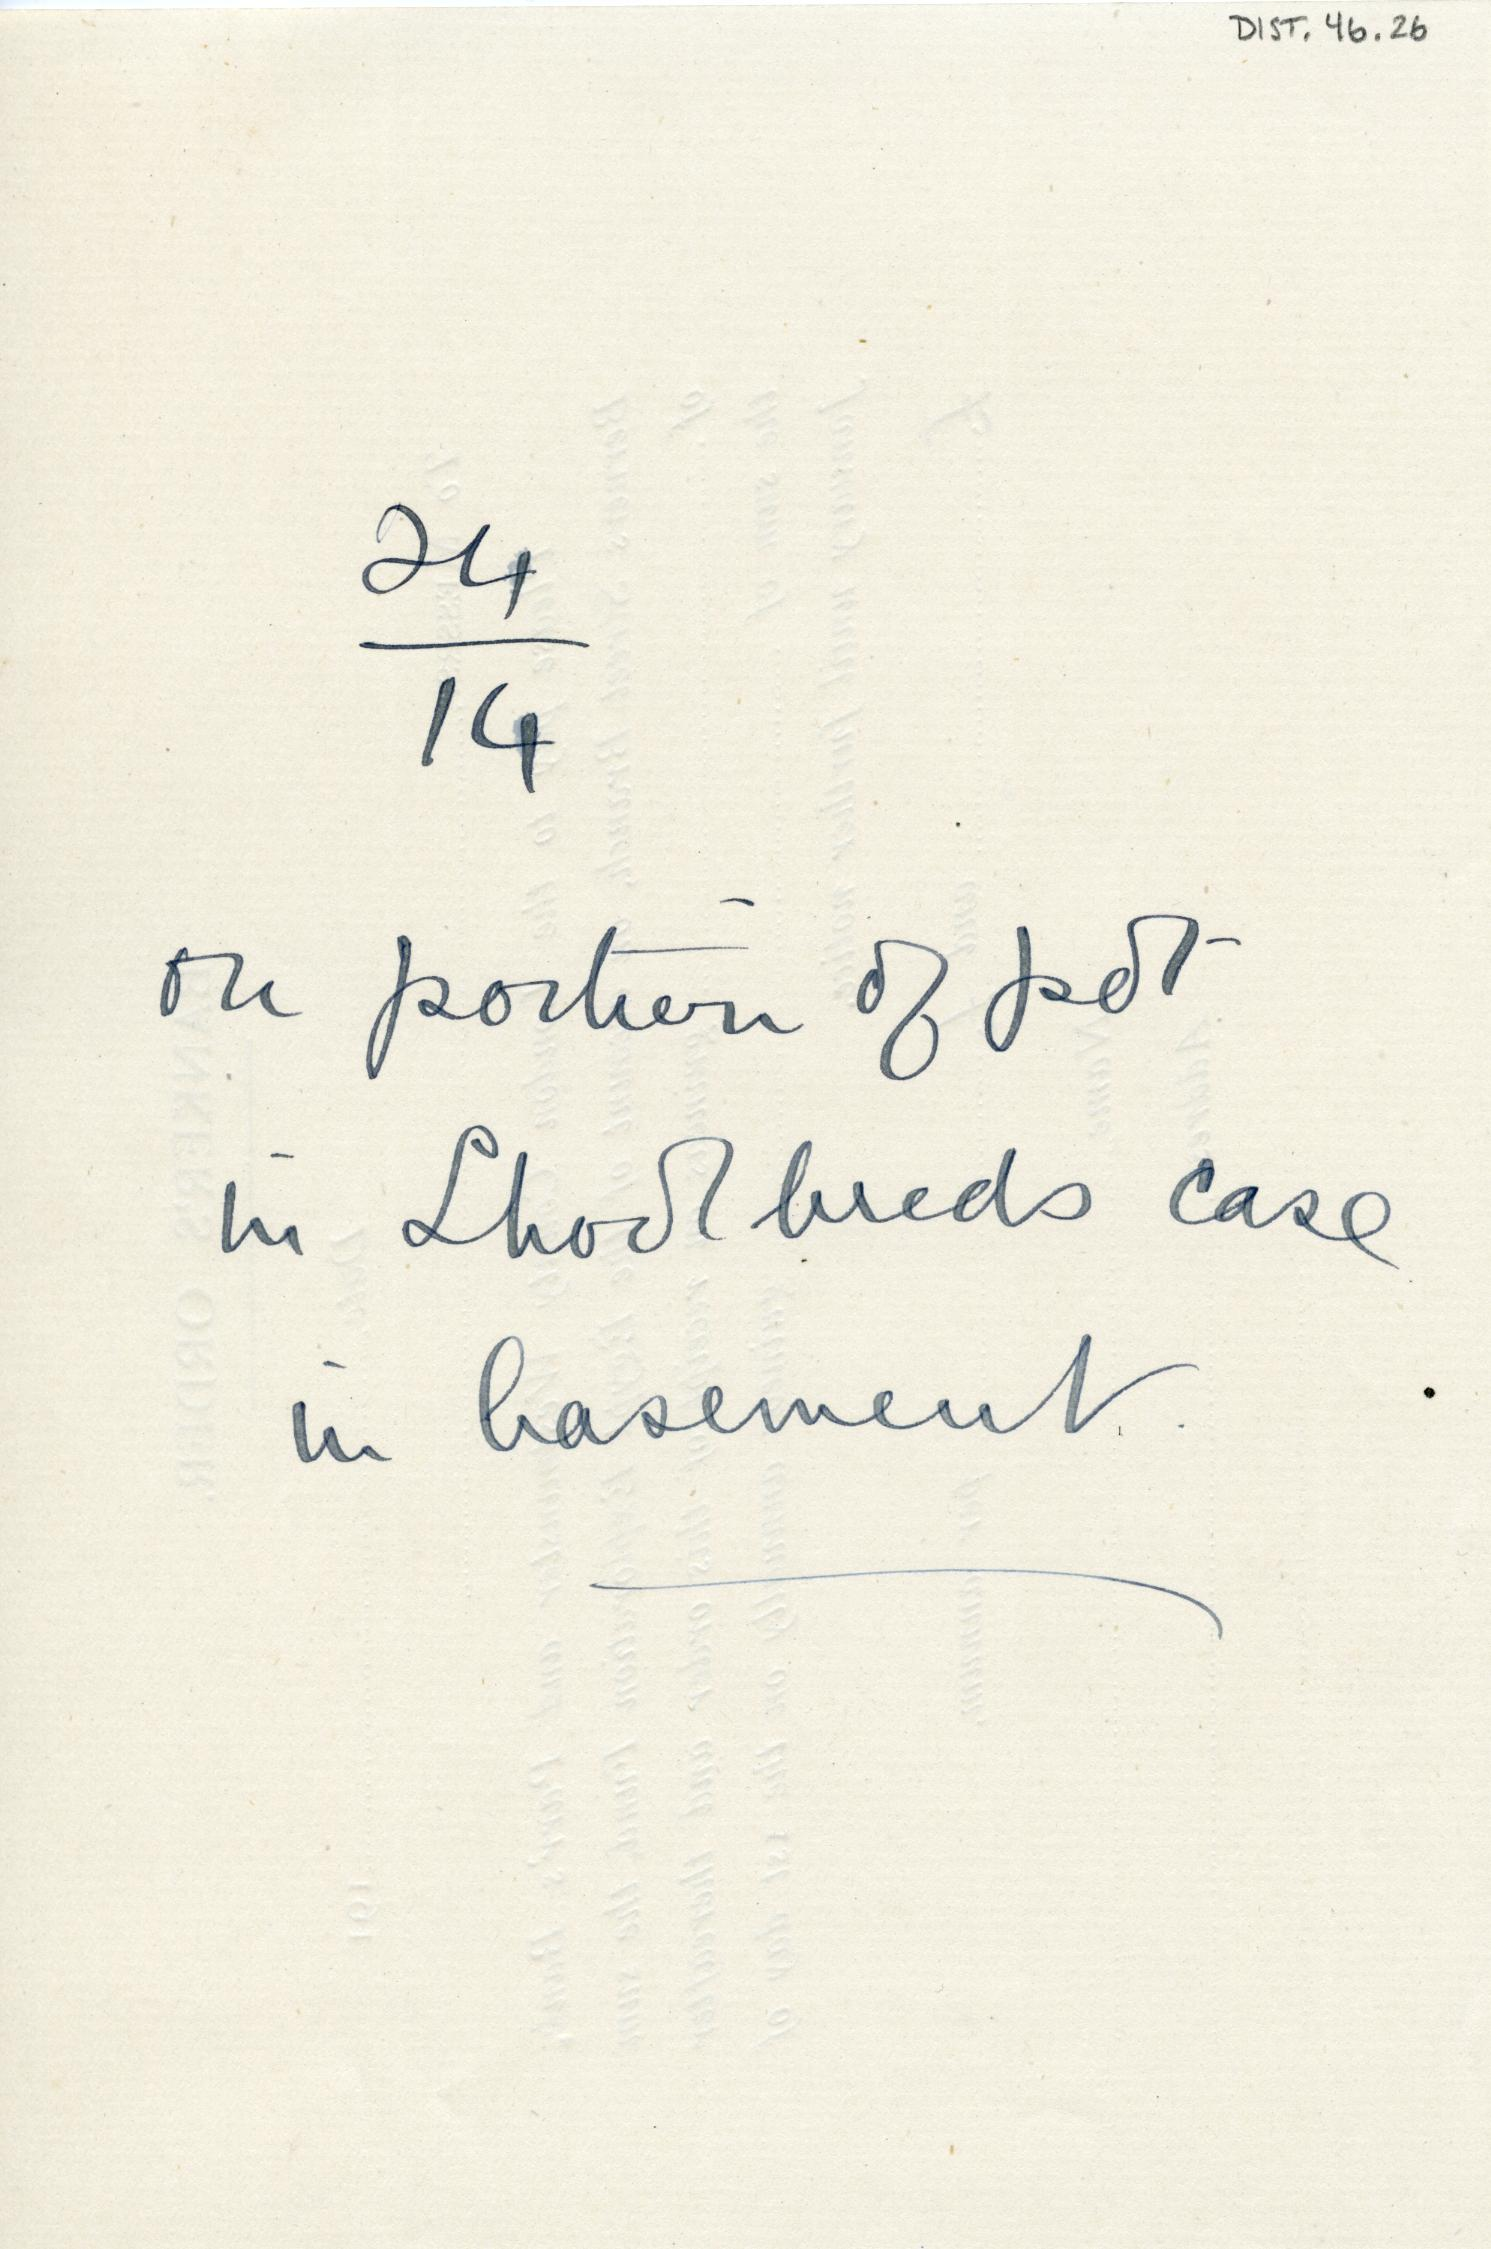 1921-25 el-Amarna DIST.46.26